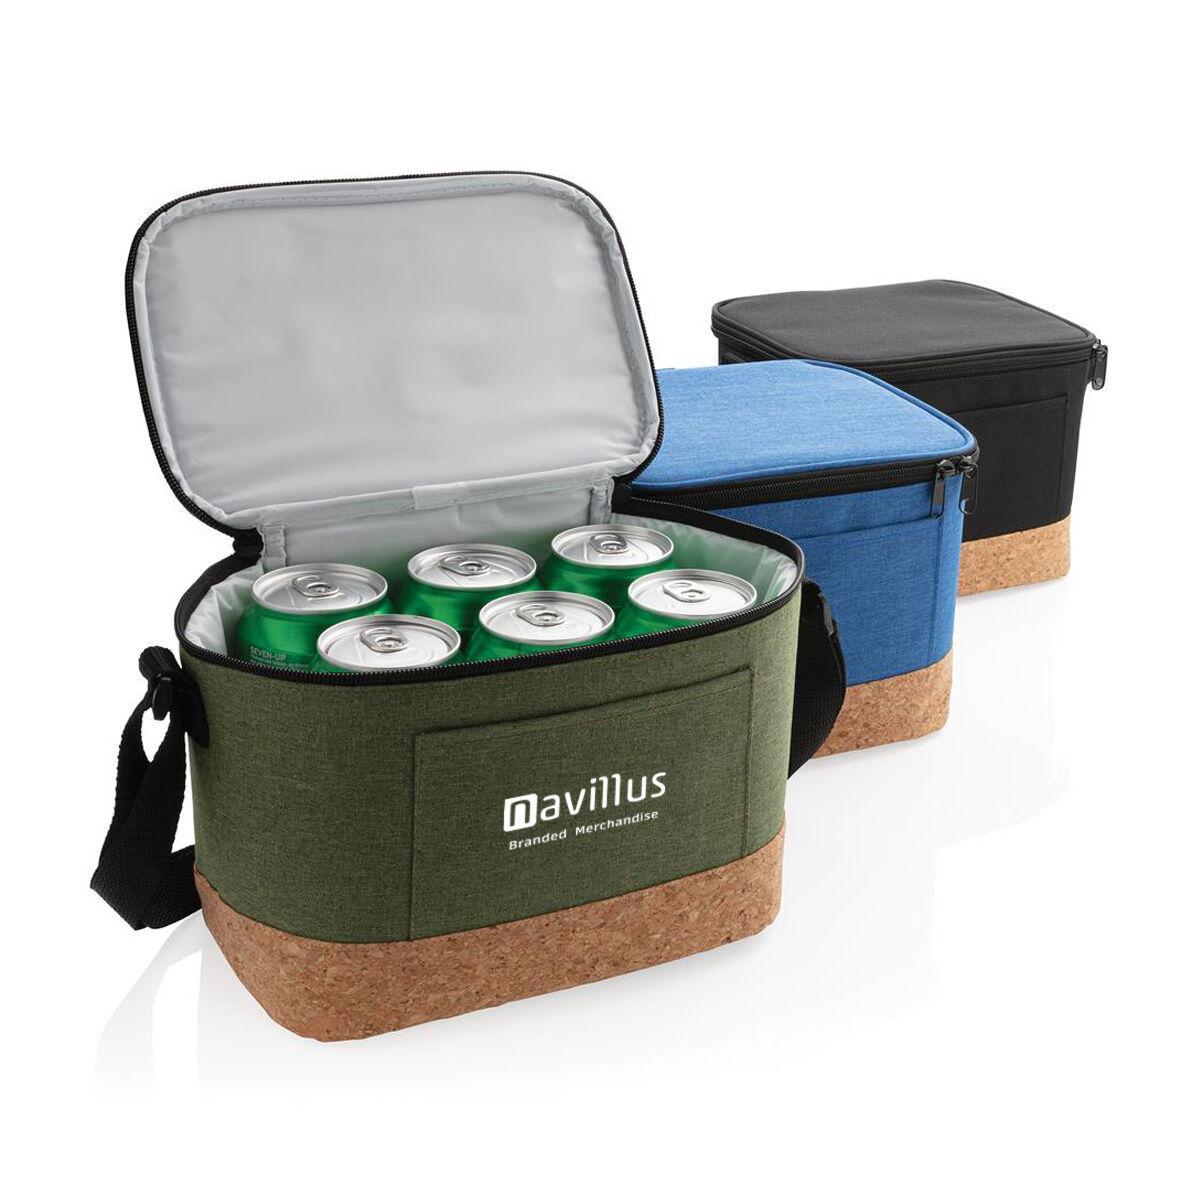 Cork Cooler Lunch Bag